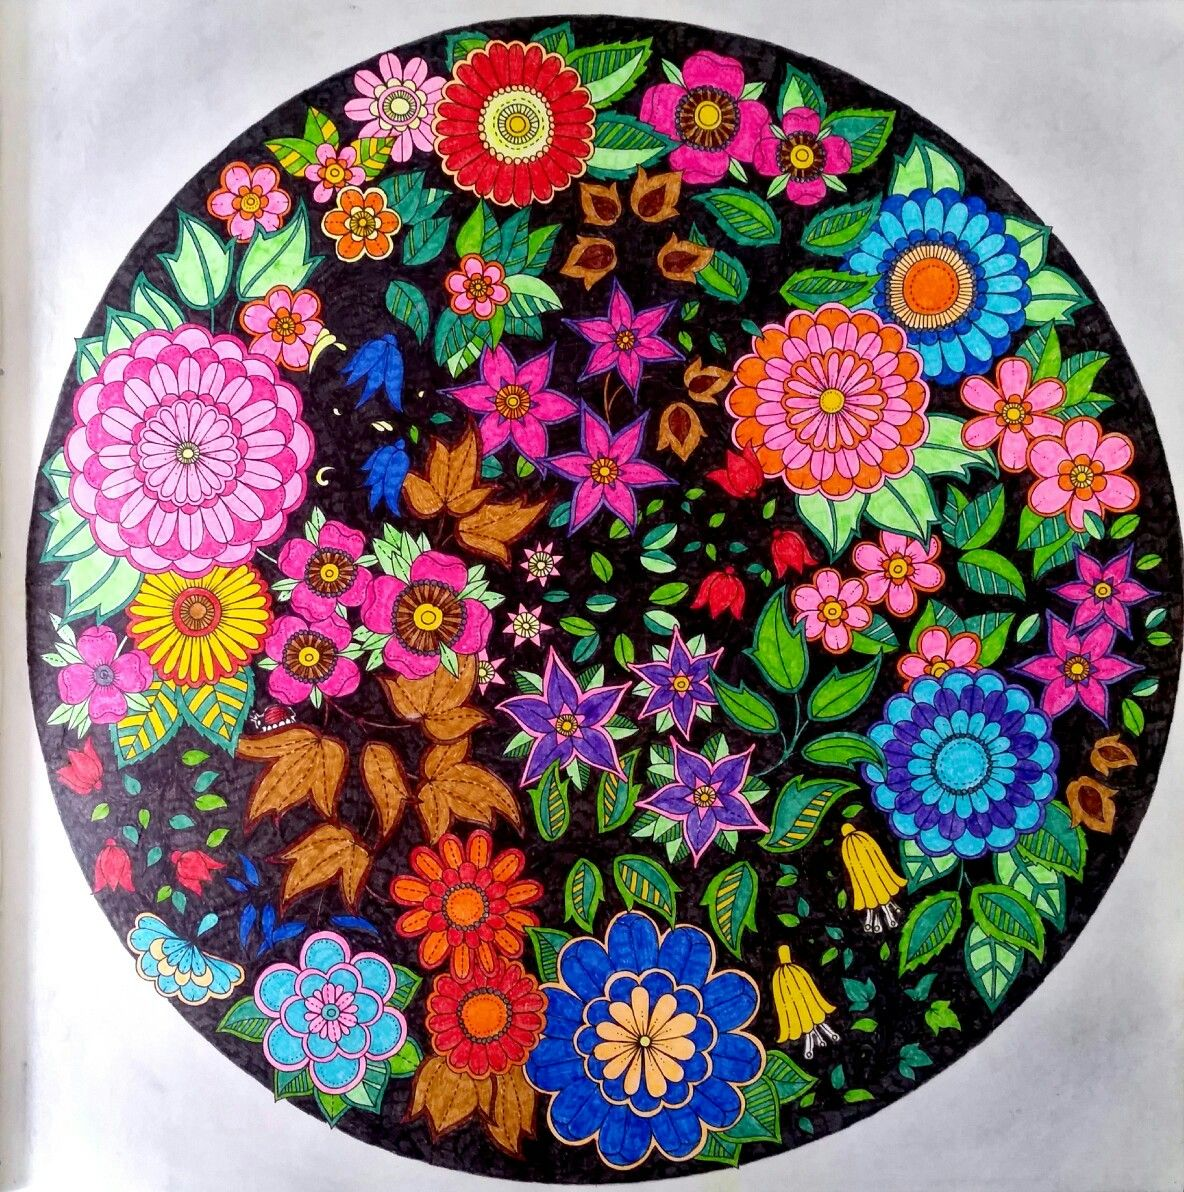 Zendoodle coloring enchanting gardens - Zendoodle Coloring Enchanting Gardens 40